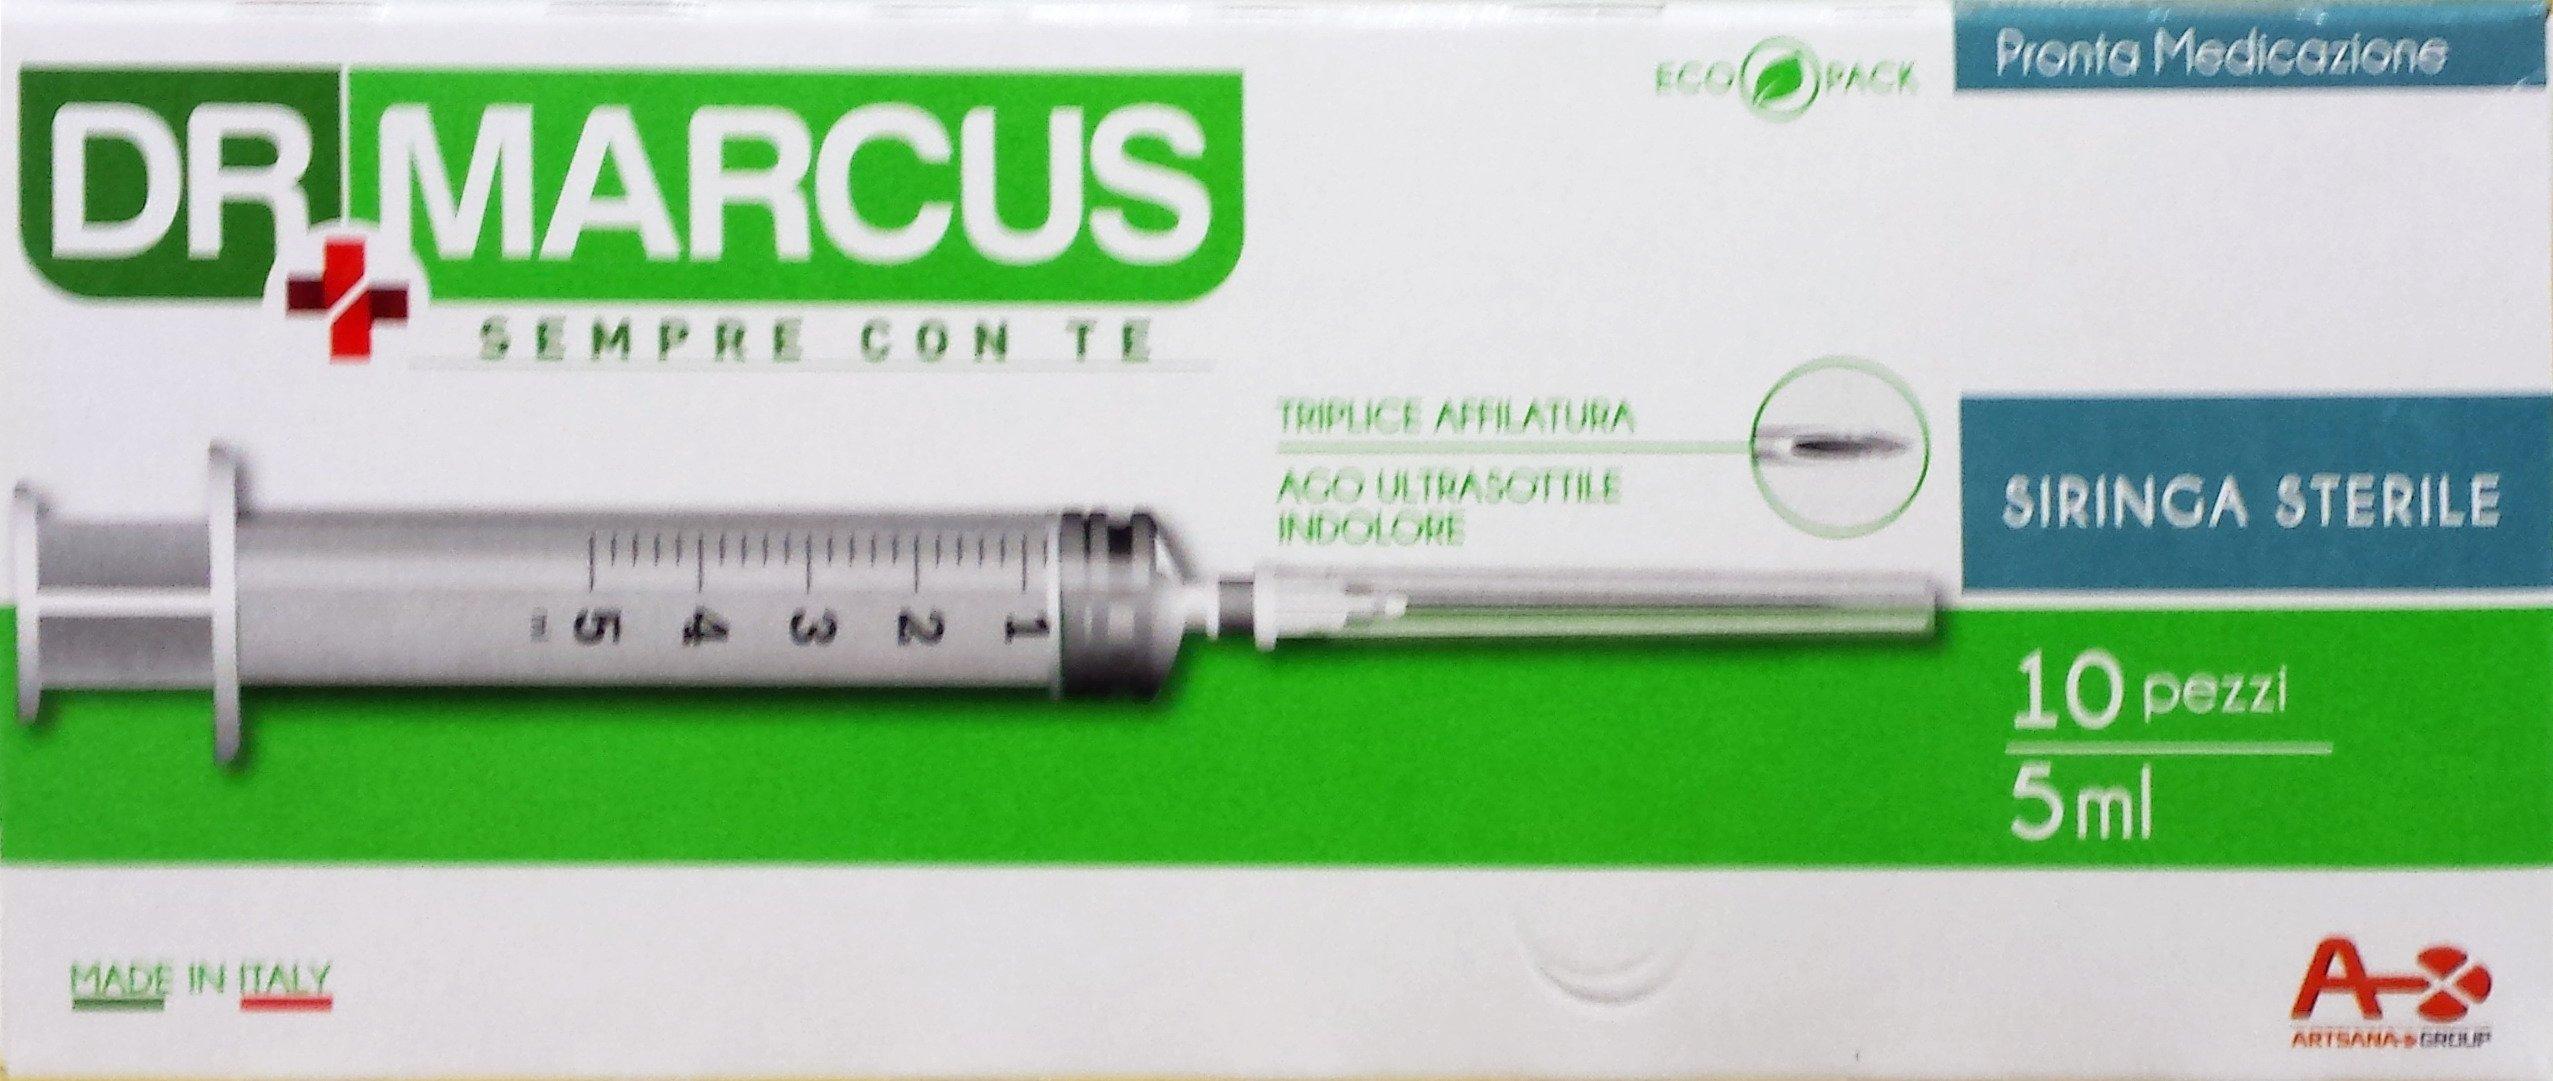 5 x DR.MARCUS Siringhe Ago Ultrasottile 10 Pezzi